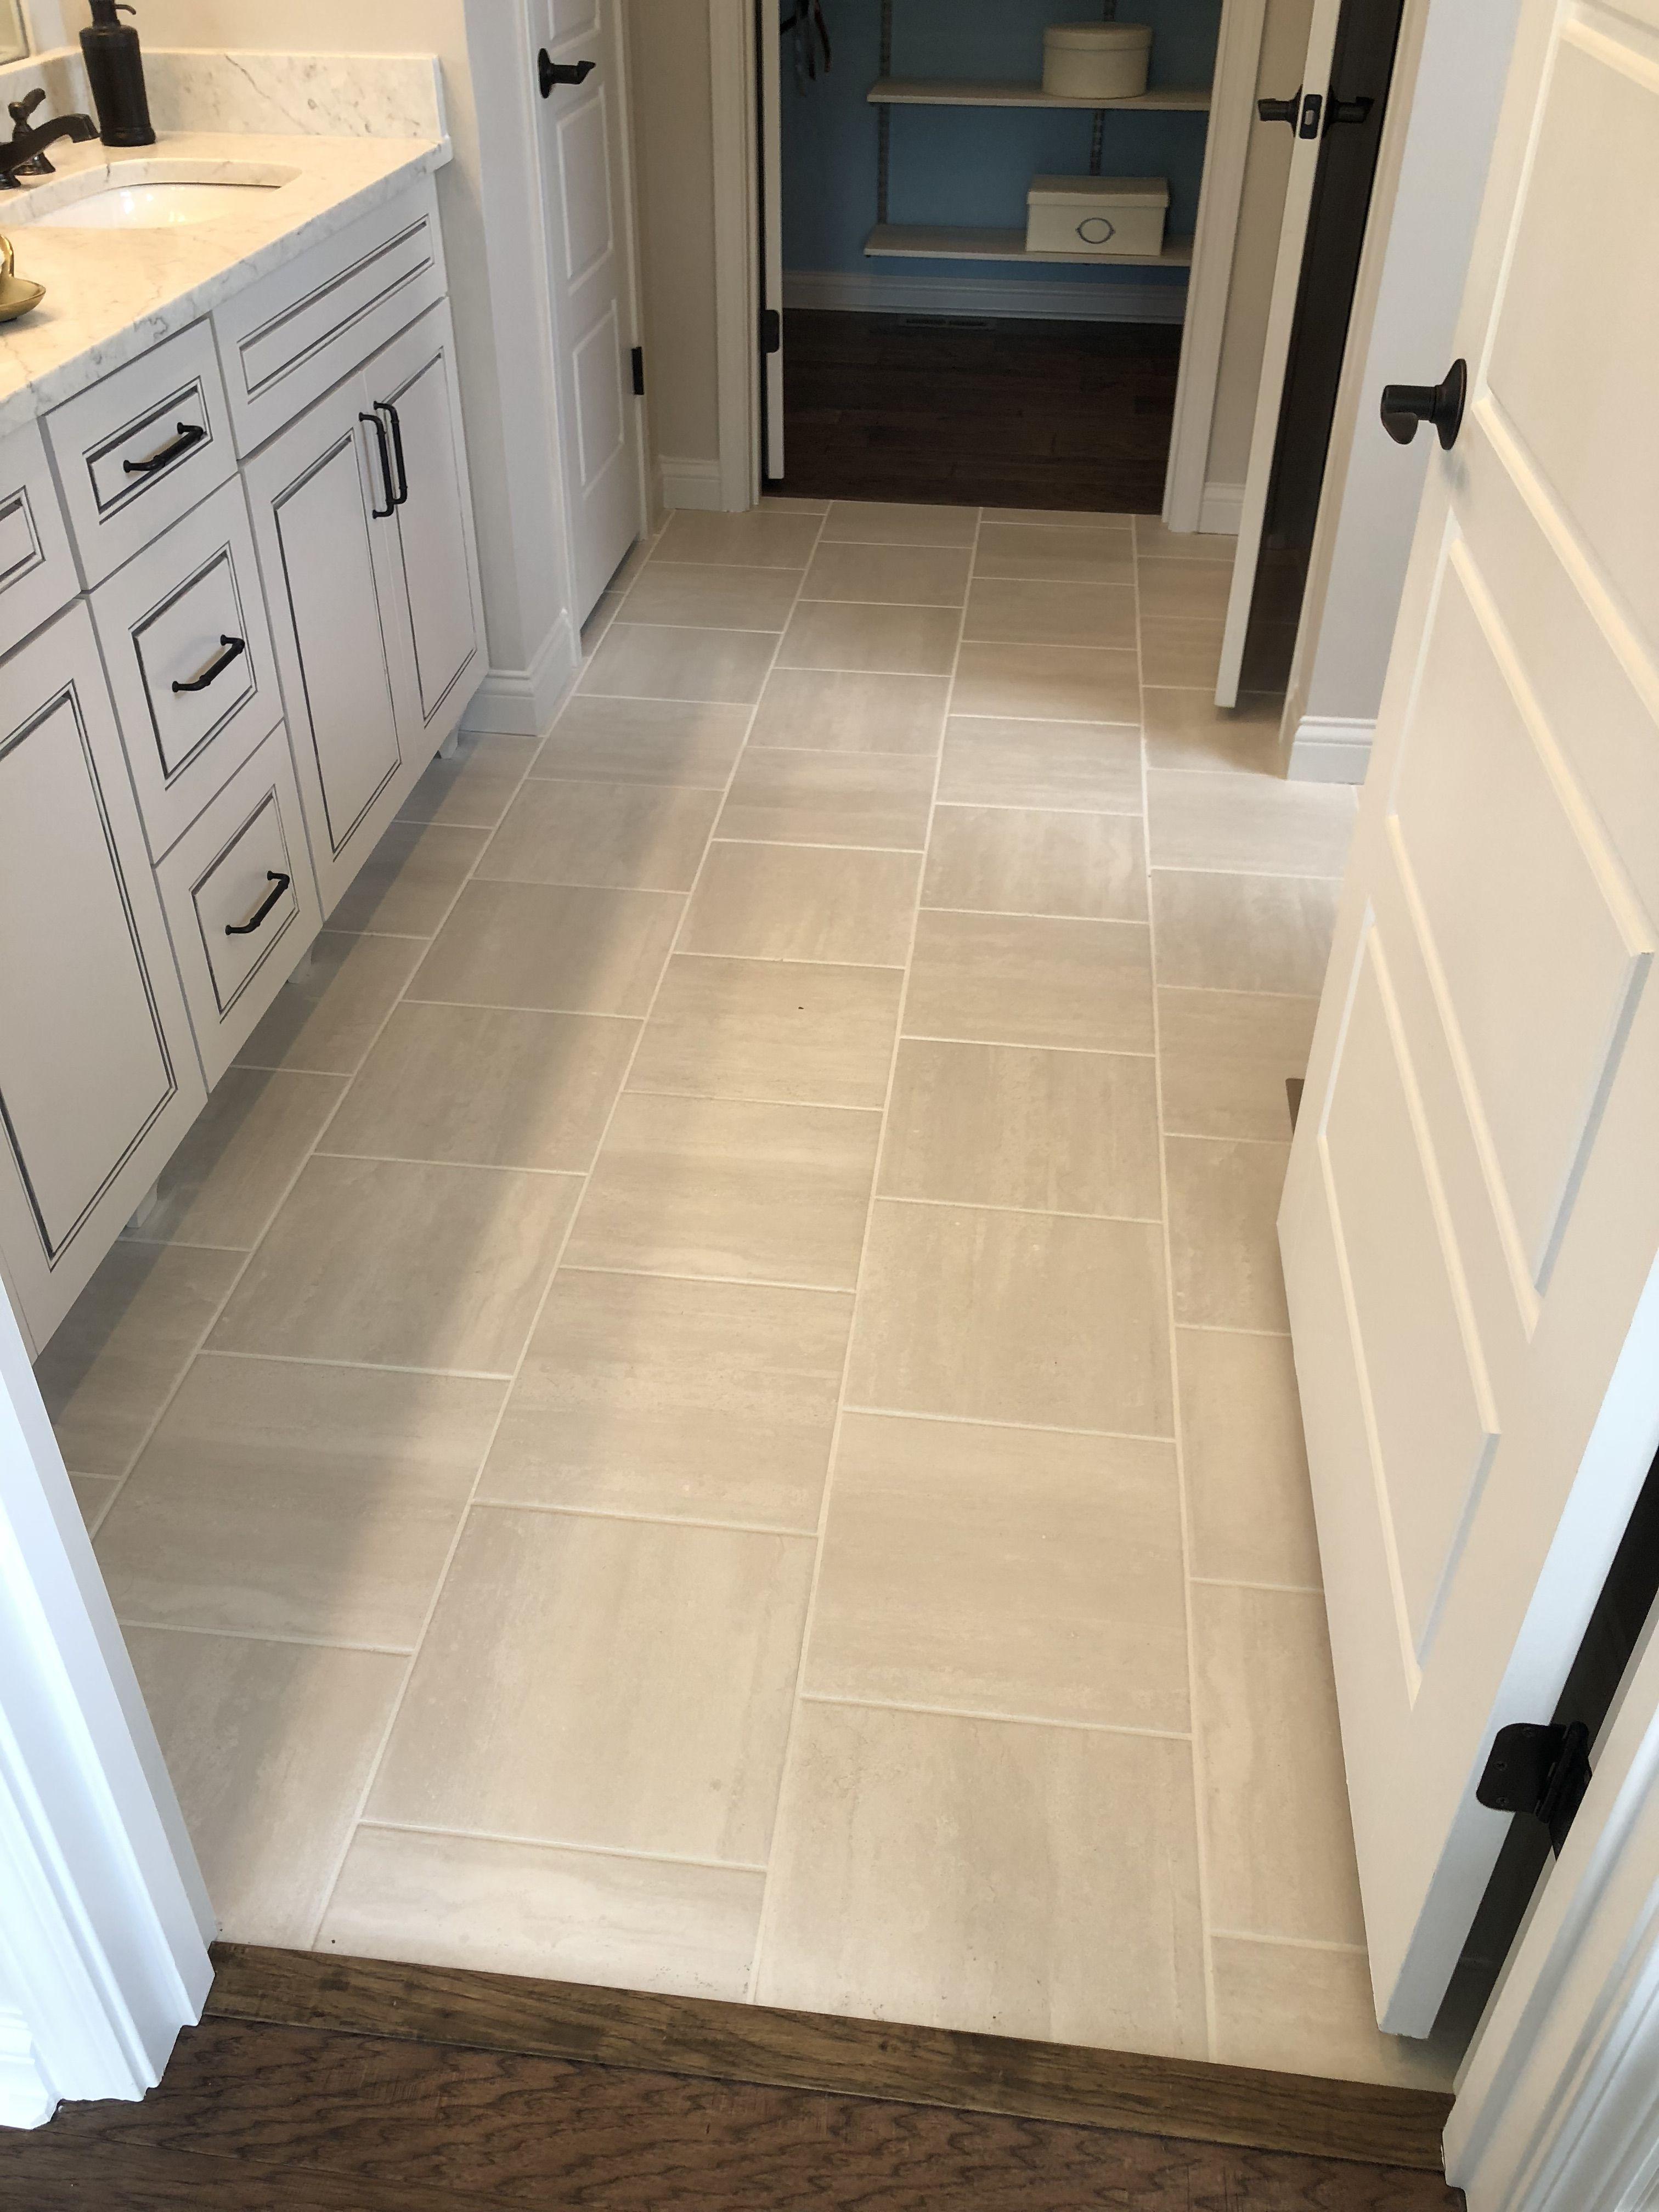 Cove Creek 13x13 Gray Floor Tile Installed Brick Joint Kitchen Tiles Slate Floor Kitchen Kitchen Design Trends 13 x 13 ceramic tile